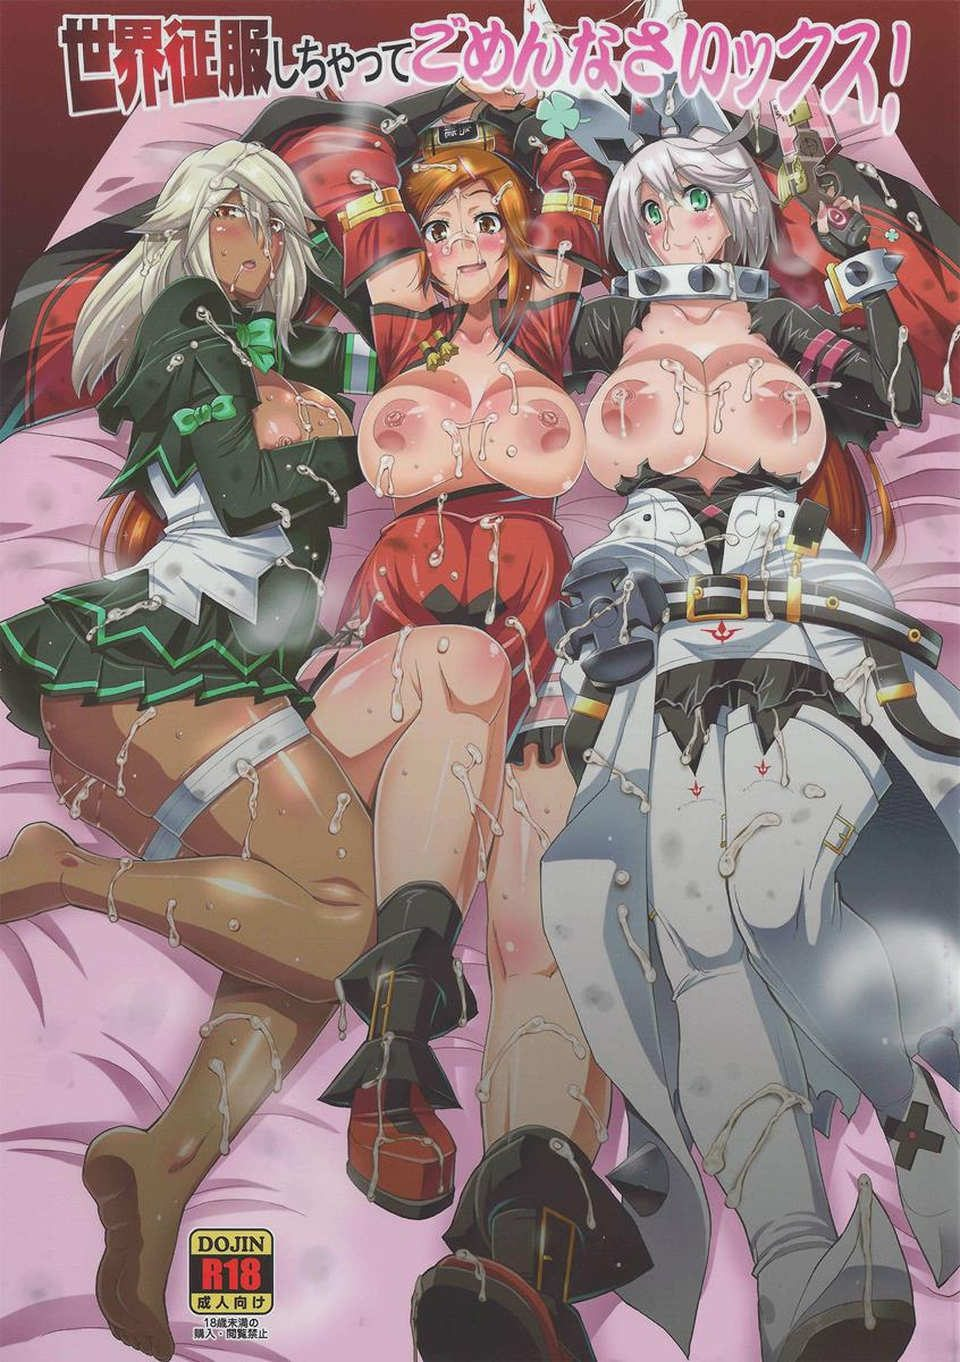 【GUILTY GEAR Xrd -REVELATOR-エロ同人誌】おっきなオッパイな3人が膣内射精(なかだし)SEX【エロ漫画】